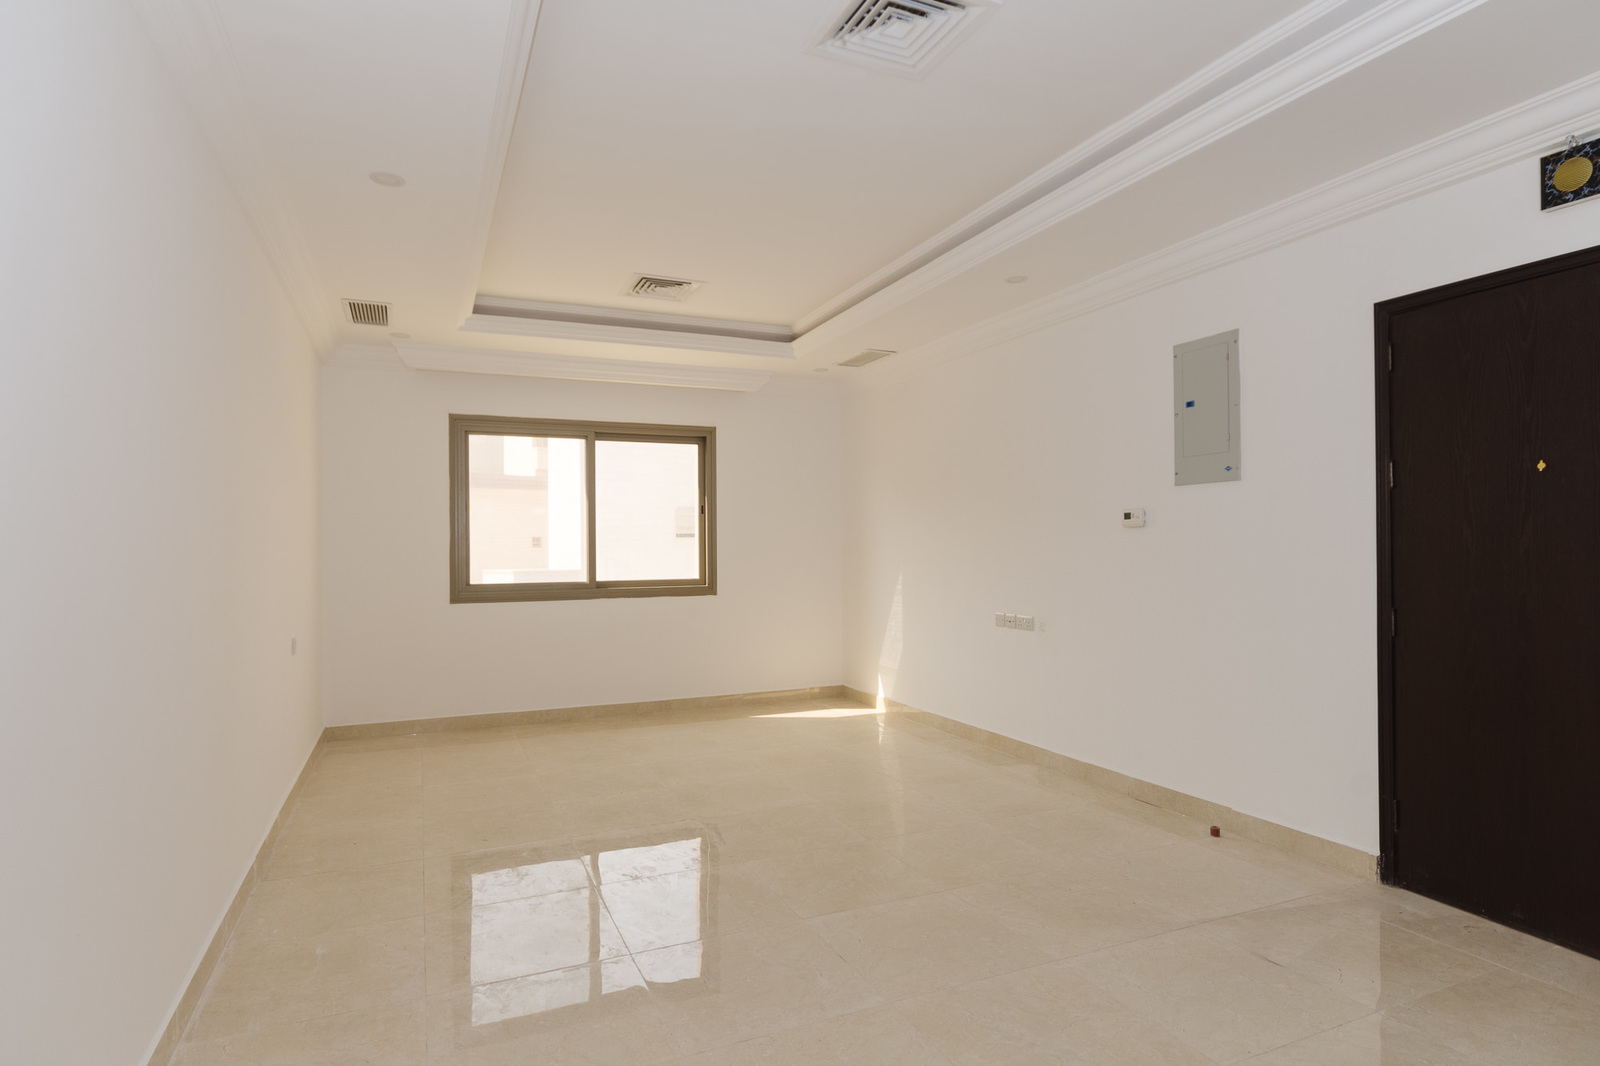 Salwa – unfurnished, three bedroom apartments